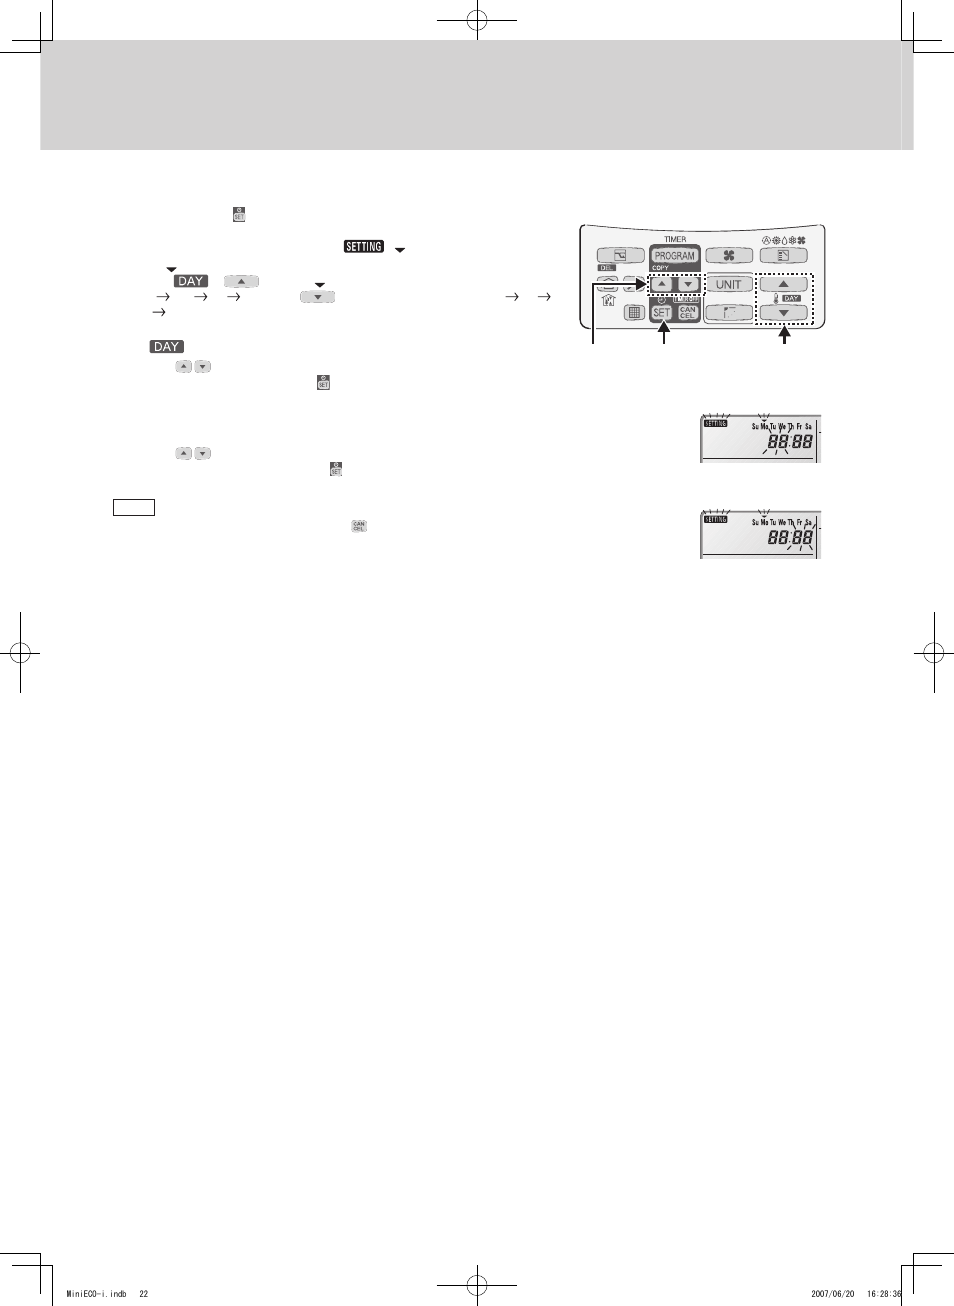 timer remote controller rcs tm80bg sanyo chx06052 user manual rh manualsdir com sanyo rcs-tm80bg user guide Owner's Manual